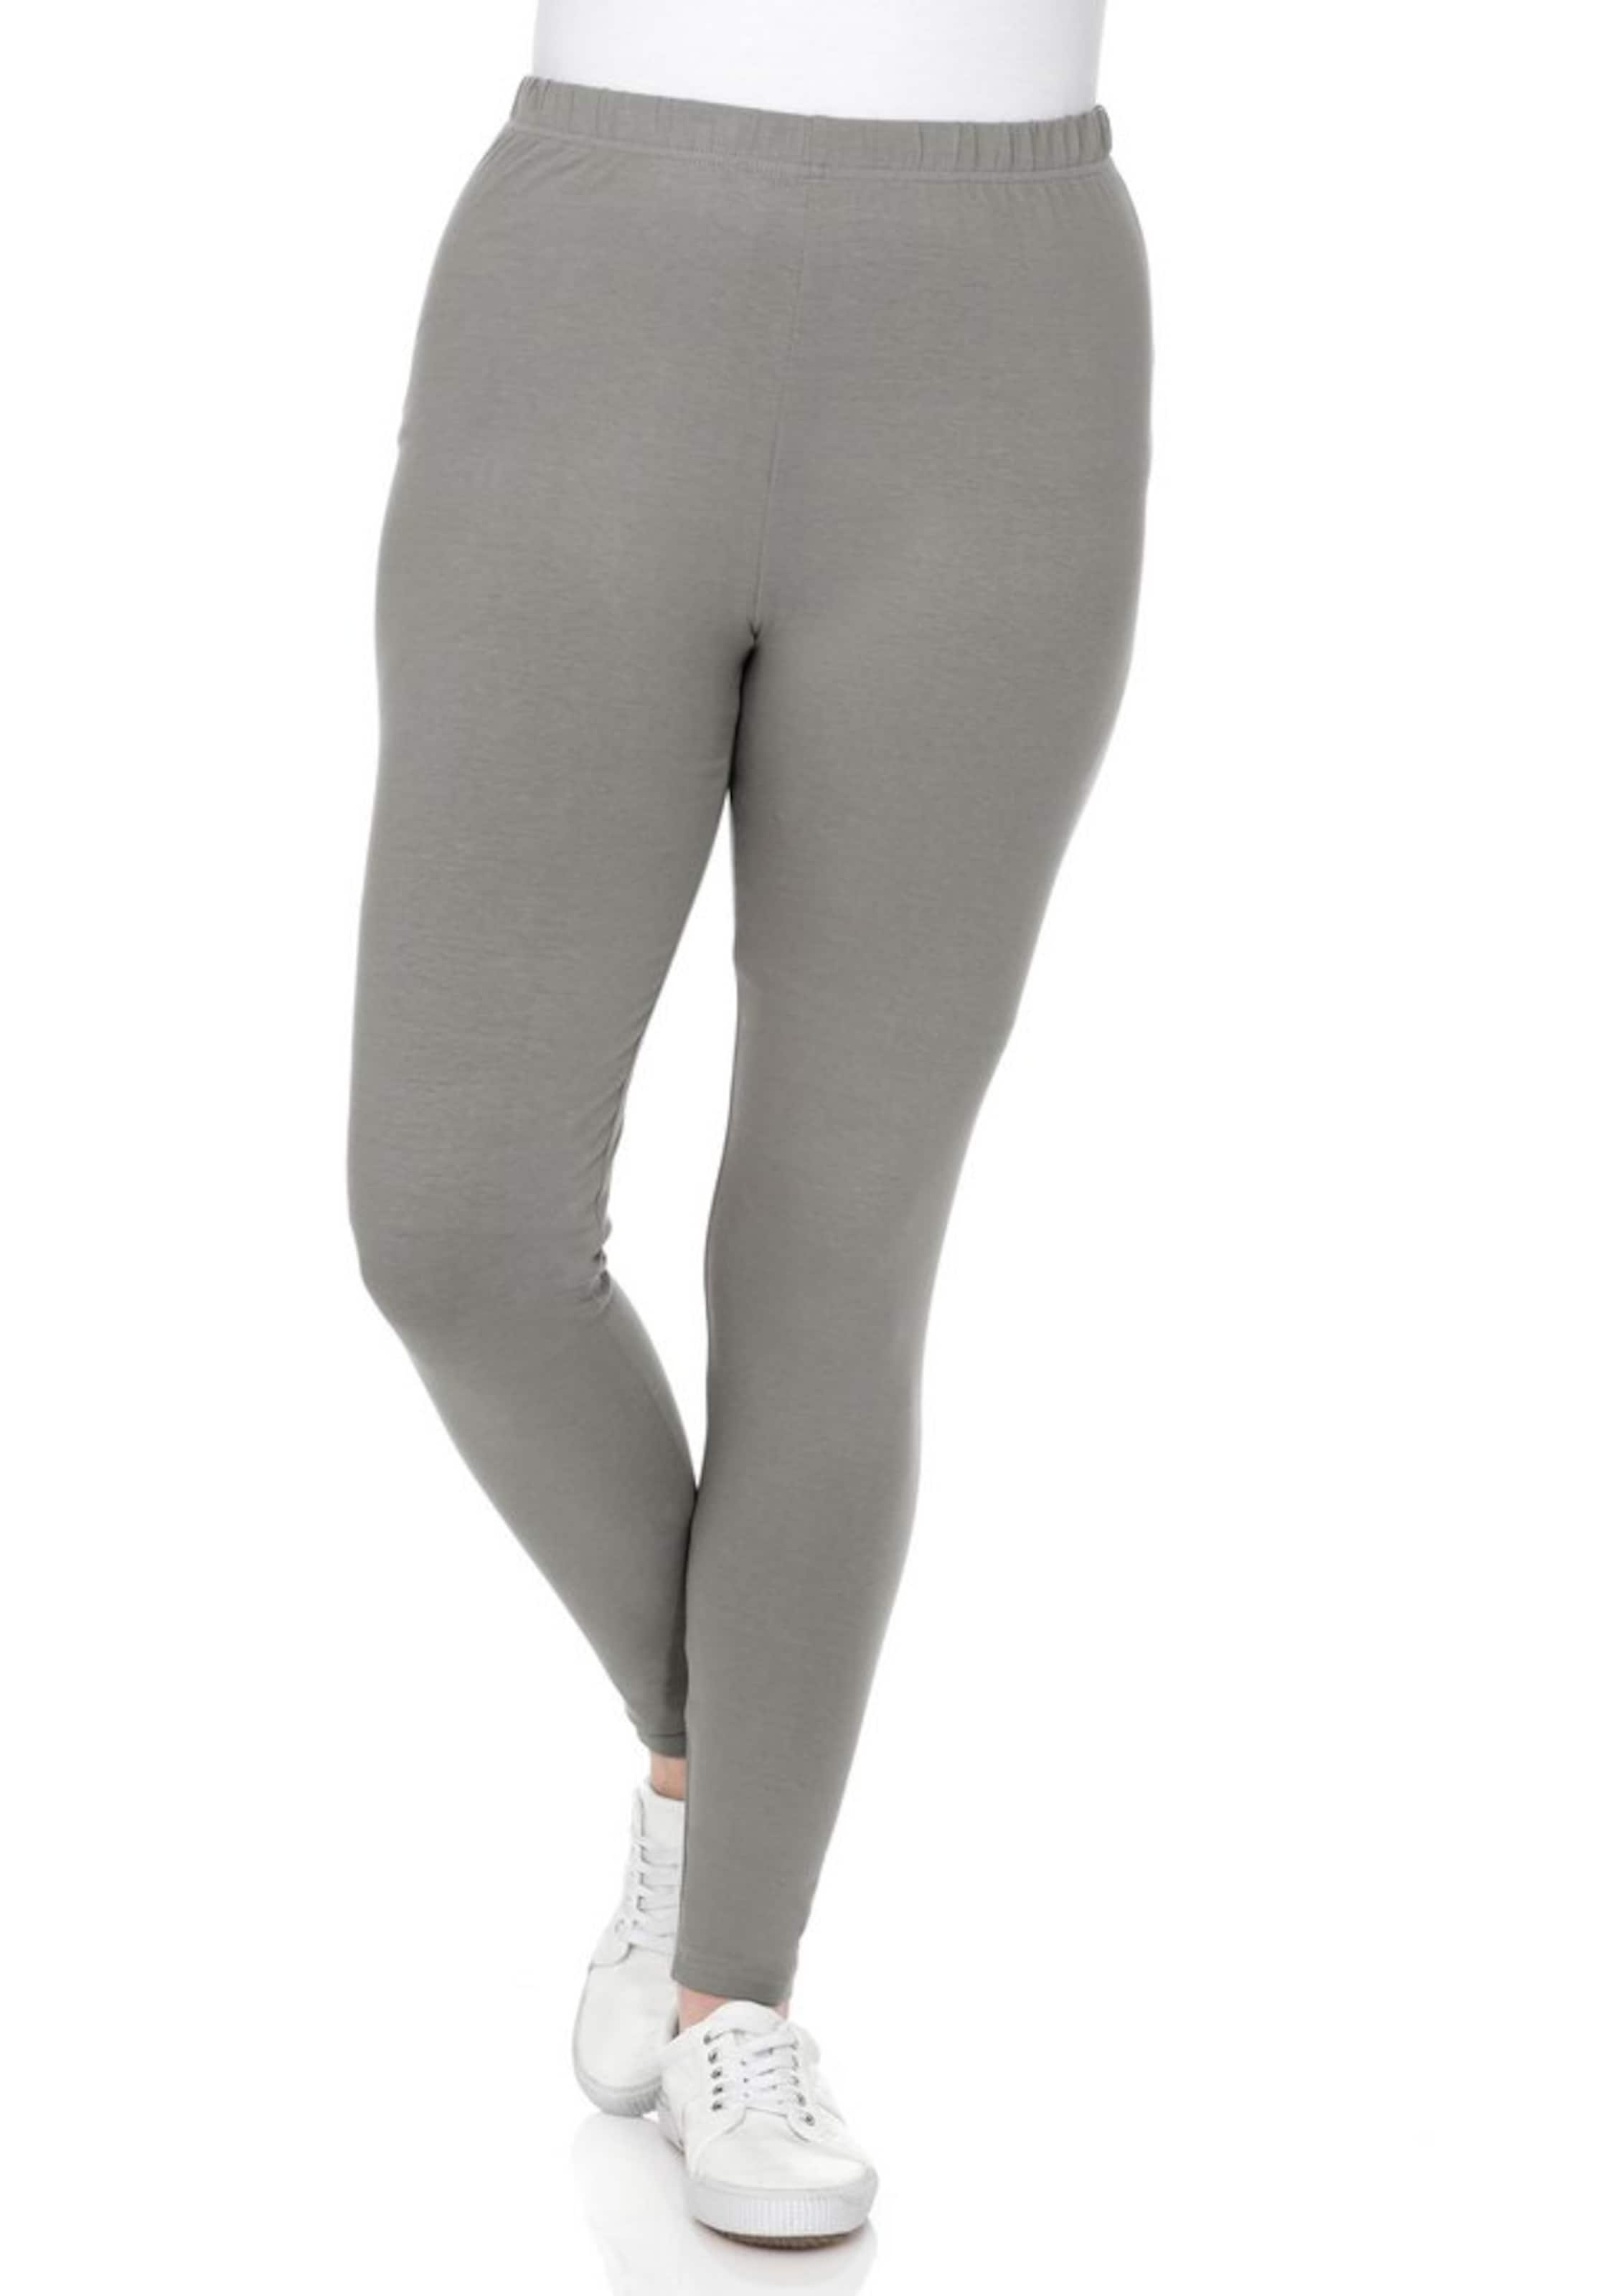 Leggings Grau In Grau Leggings Leggings Sheego Sheego Sheego In wOXTkPZui